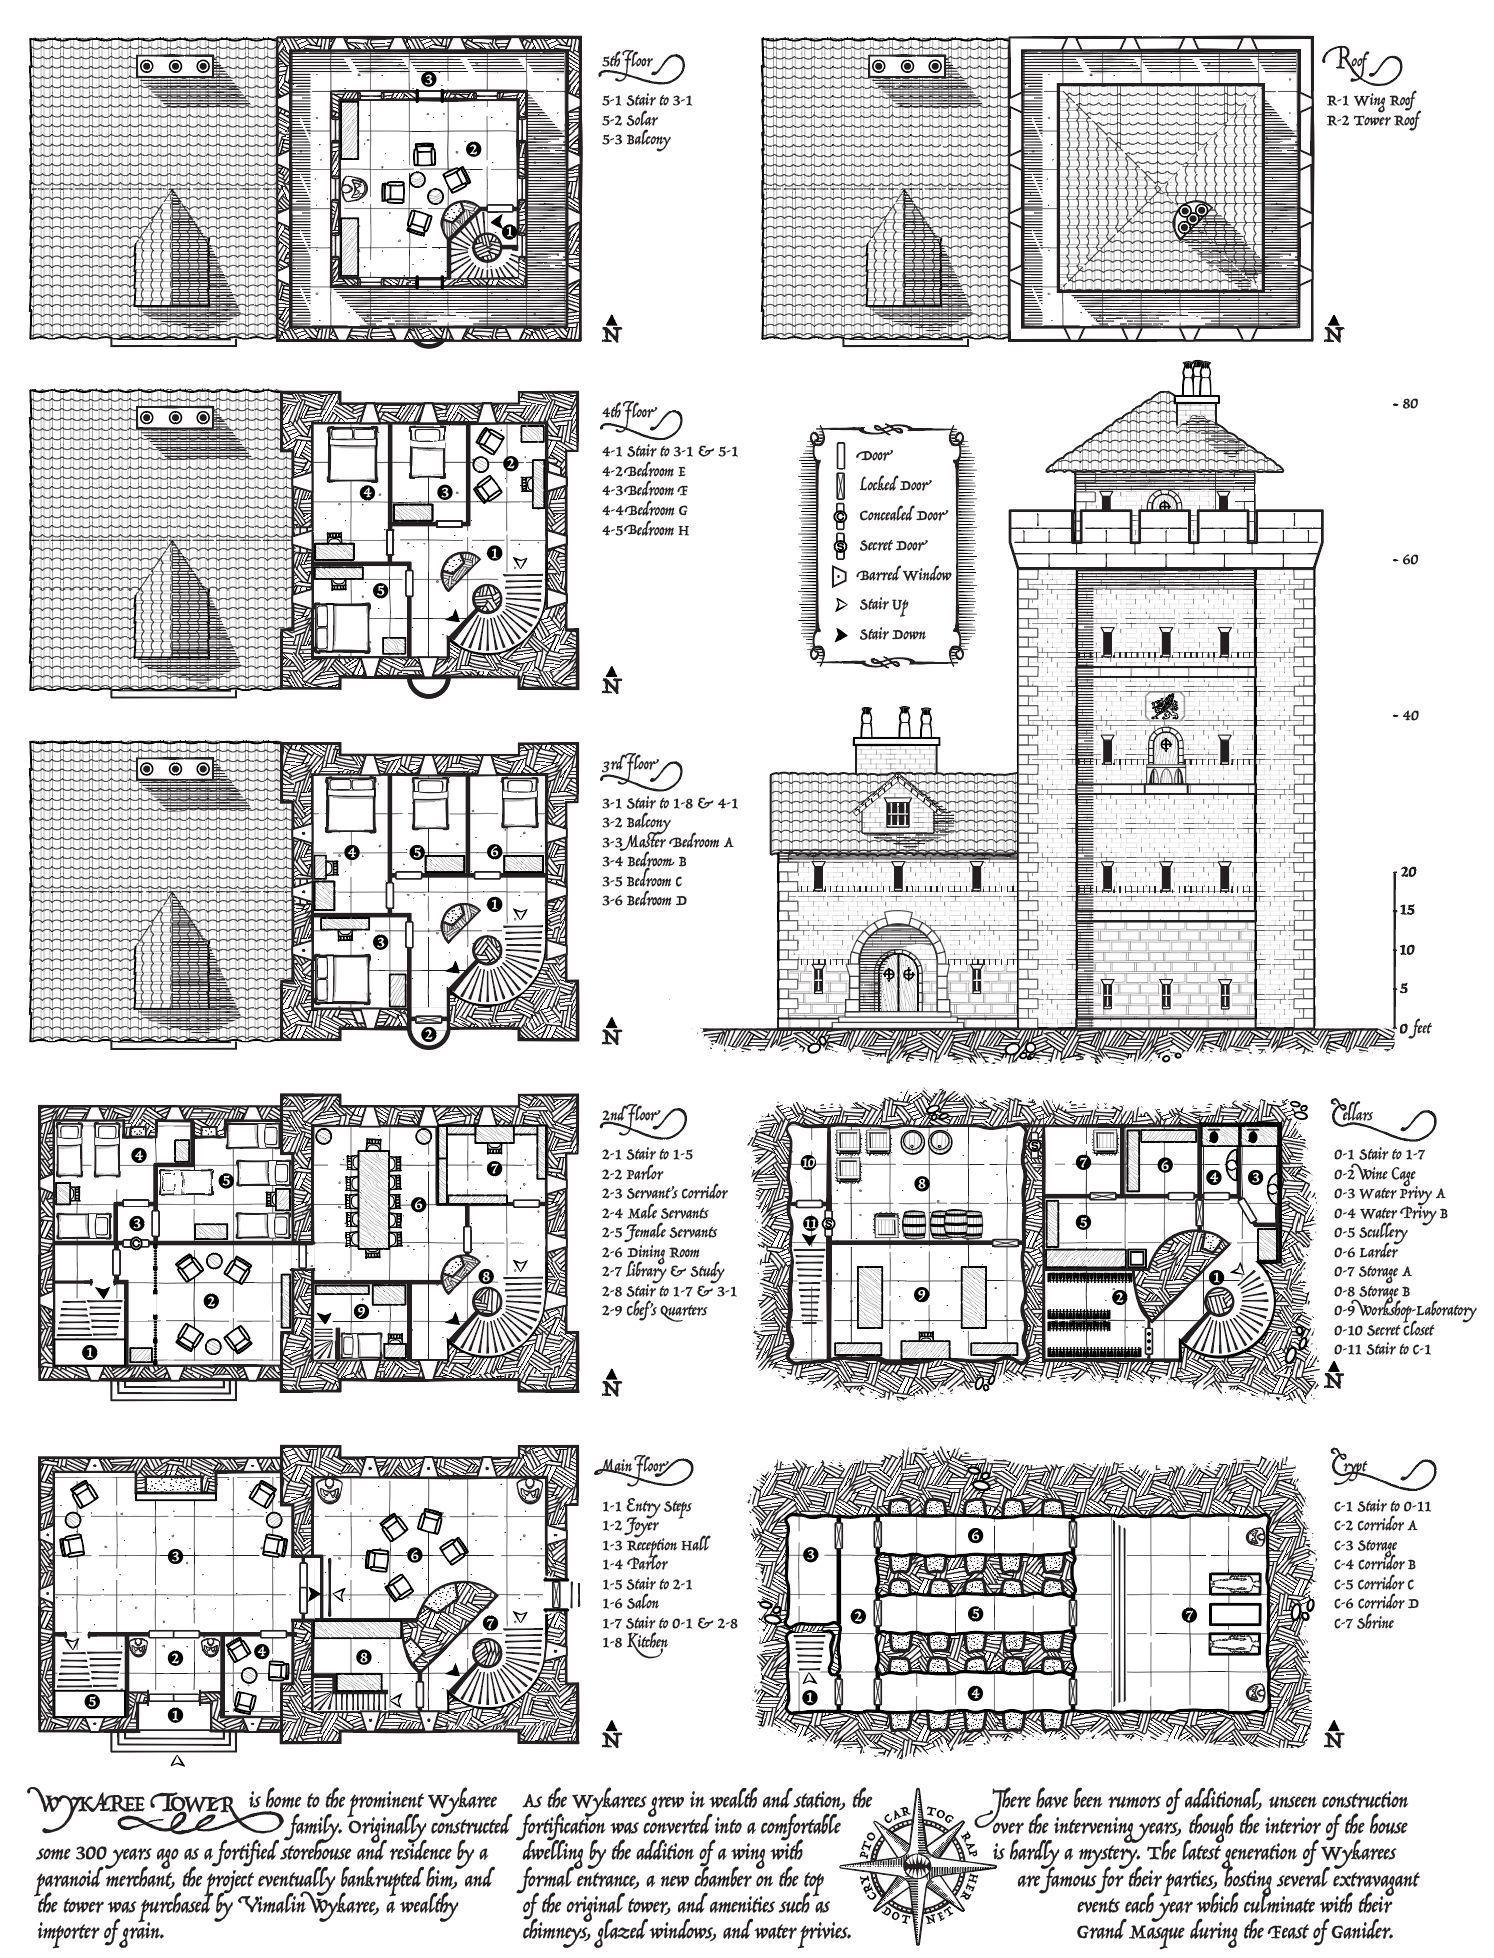 Antiga Prefeitura No Passado Era Um Lugar Usado Pela Nobreza Para Debater Als P Antiga Prefeitura Keine Passa In 2020 Fantasie Karte Antike Architektur Baustil